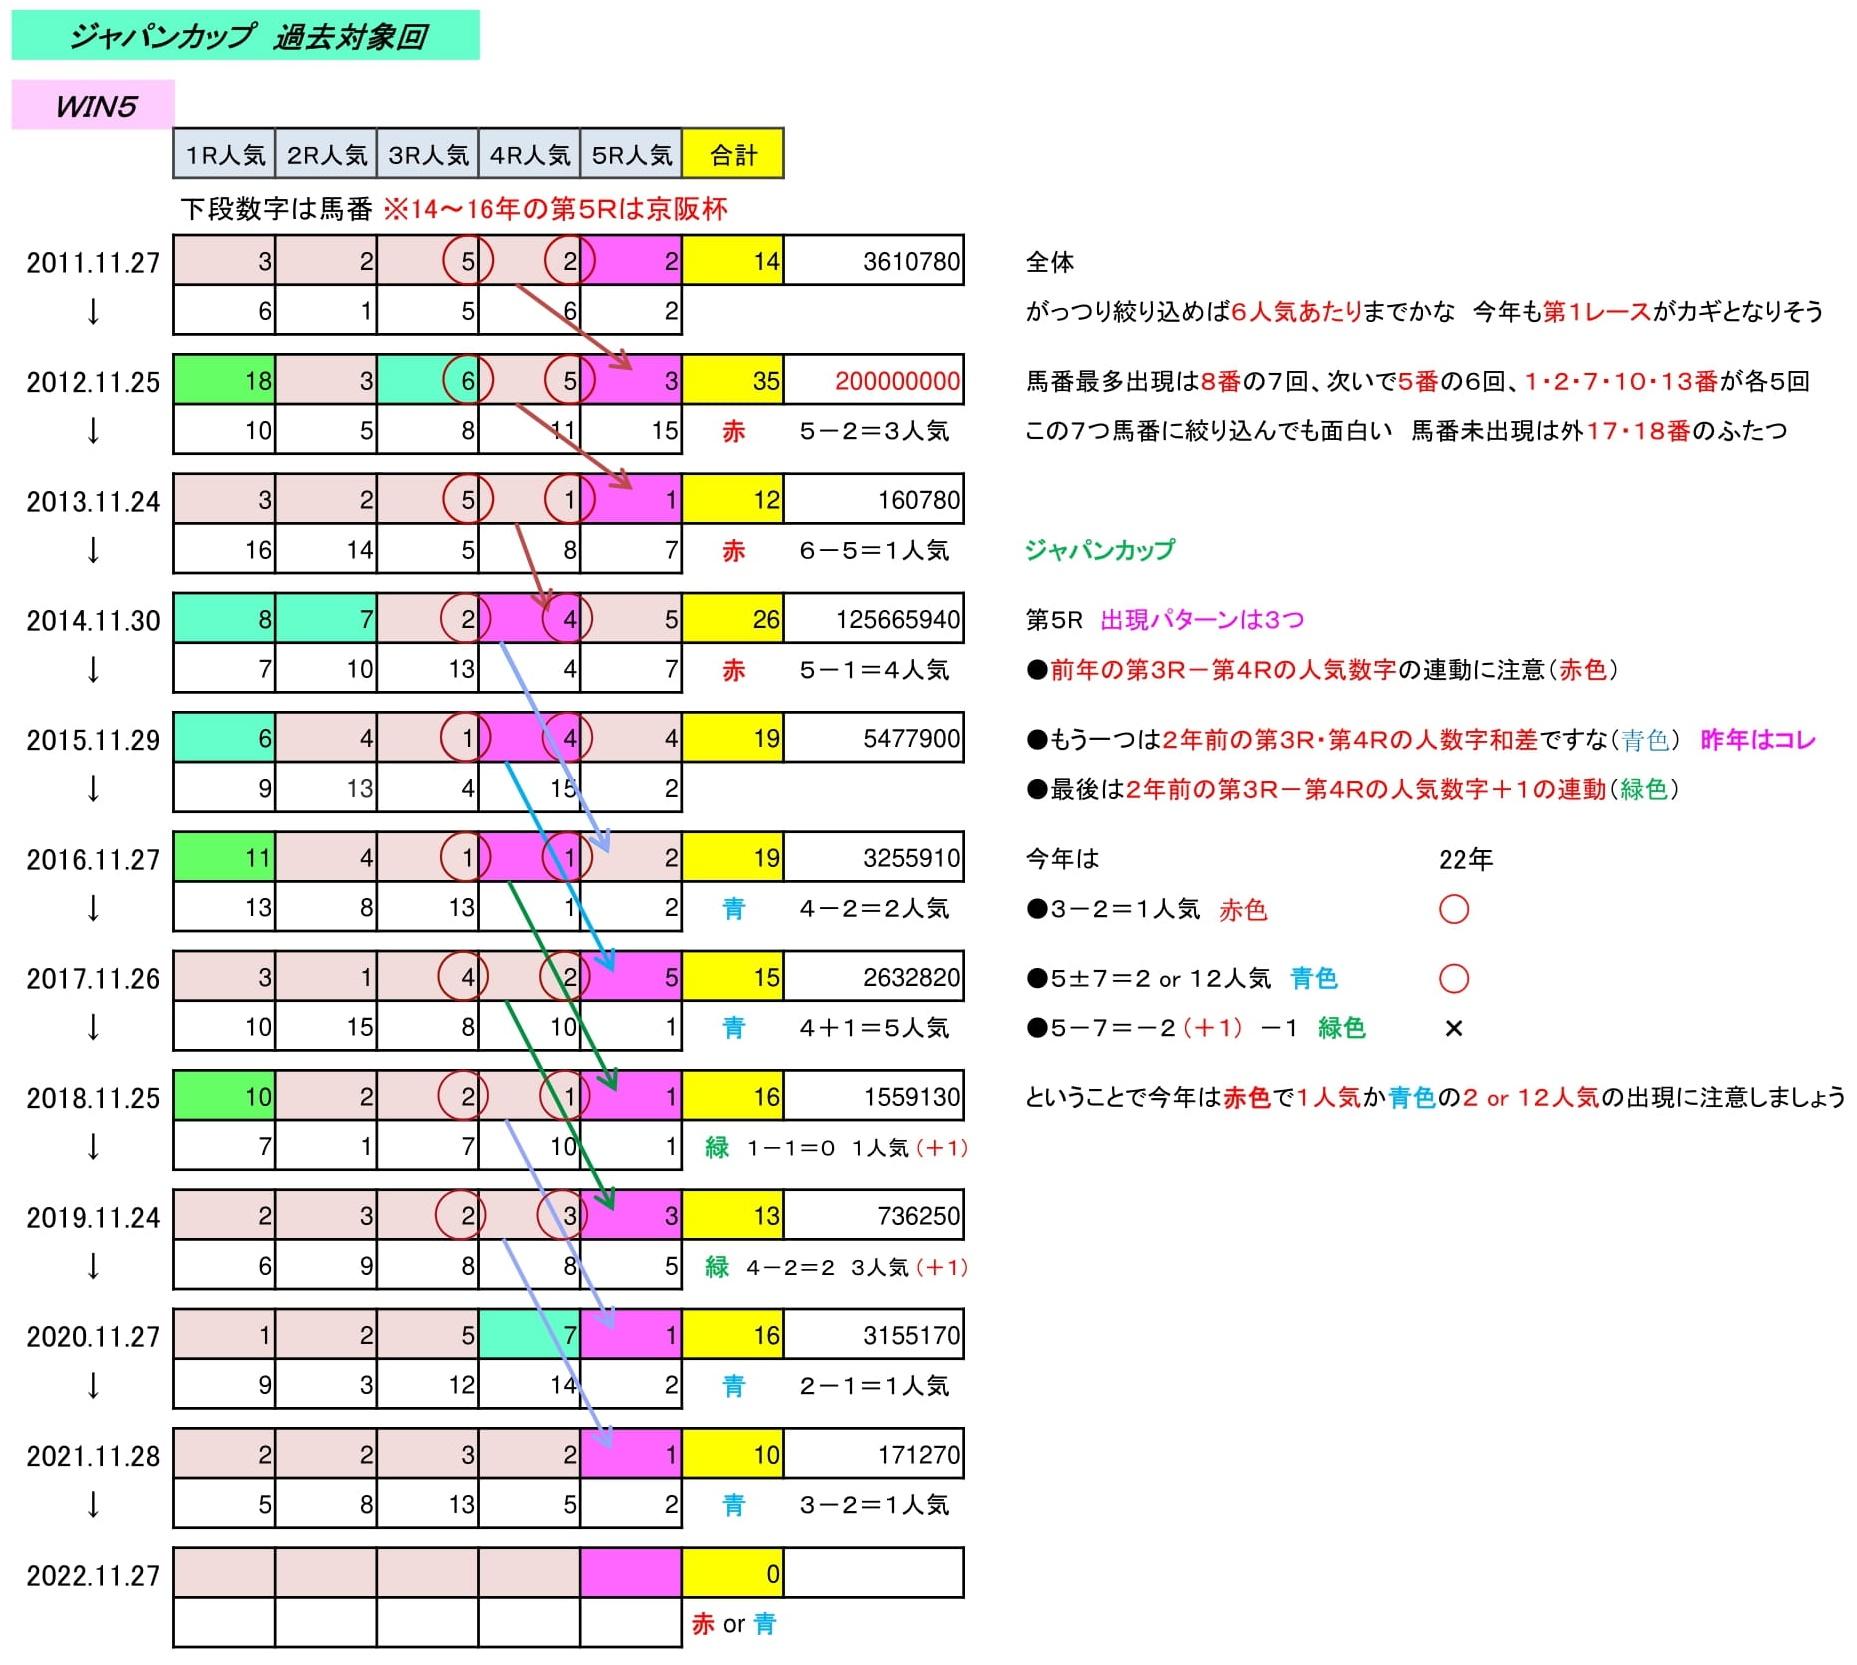 11_27_win5a.jpg